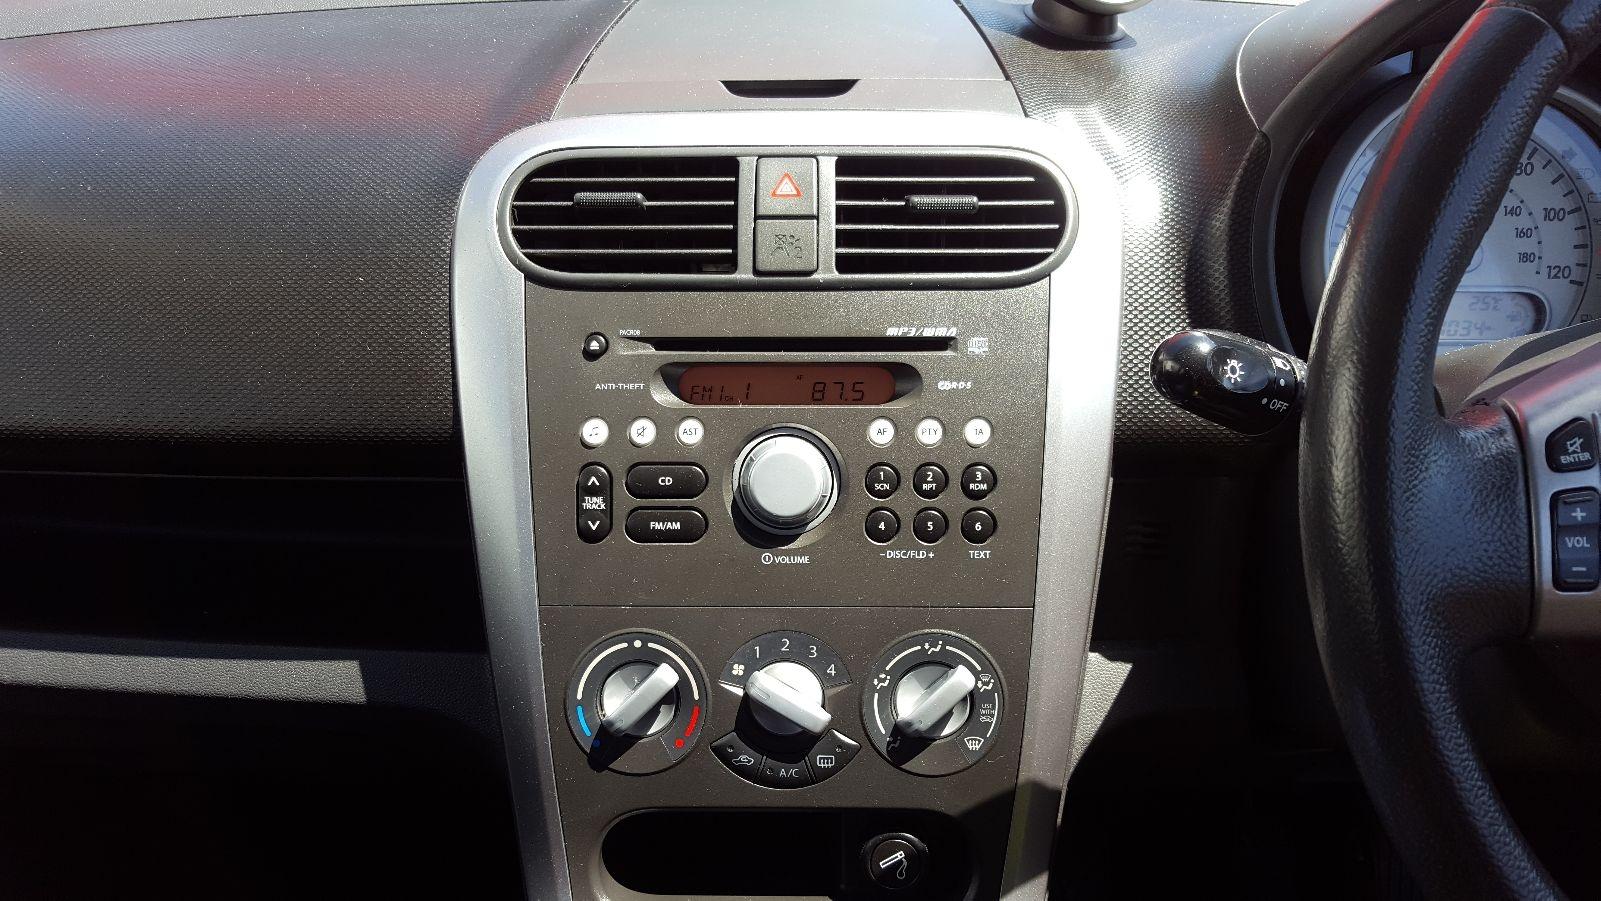 Image for a 2008 Suzuki Splash 1.2 Petrol K12B Engine